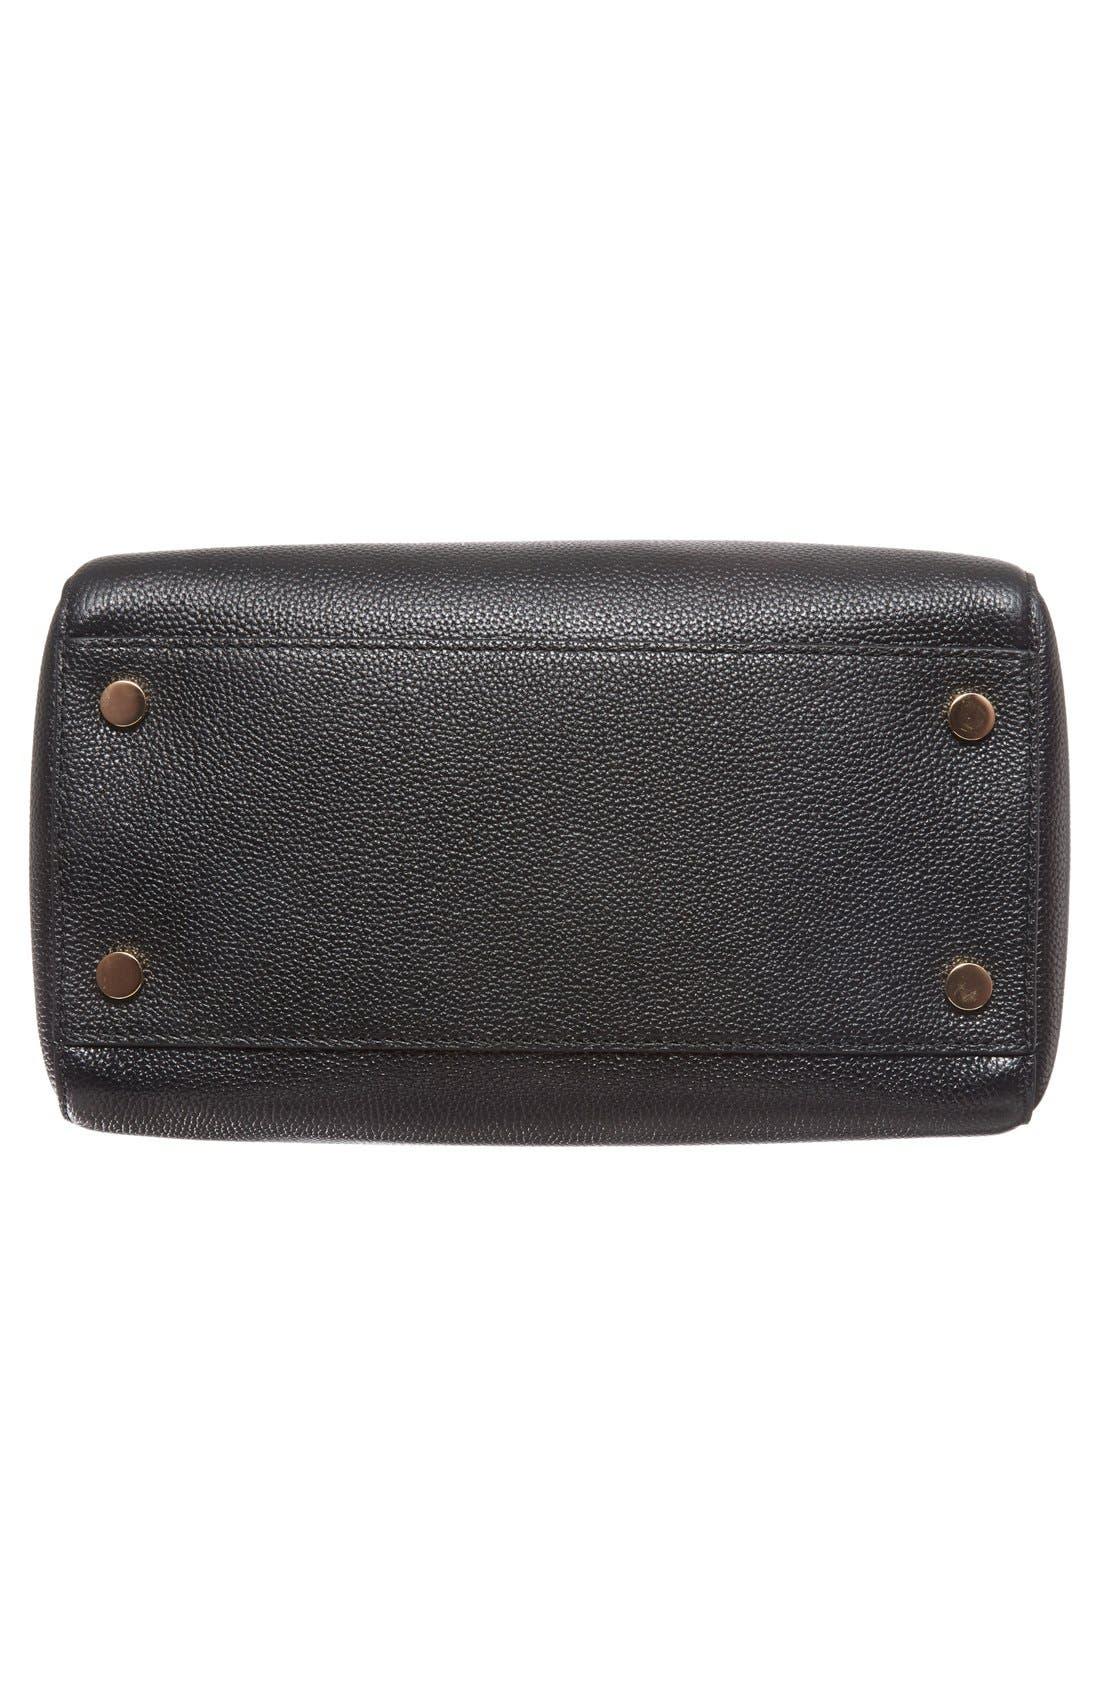 Medium Mercer Duffel Bag,                             Alternate thumbnail 8, color,                             001